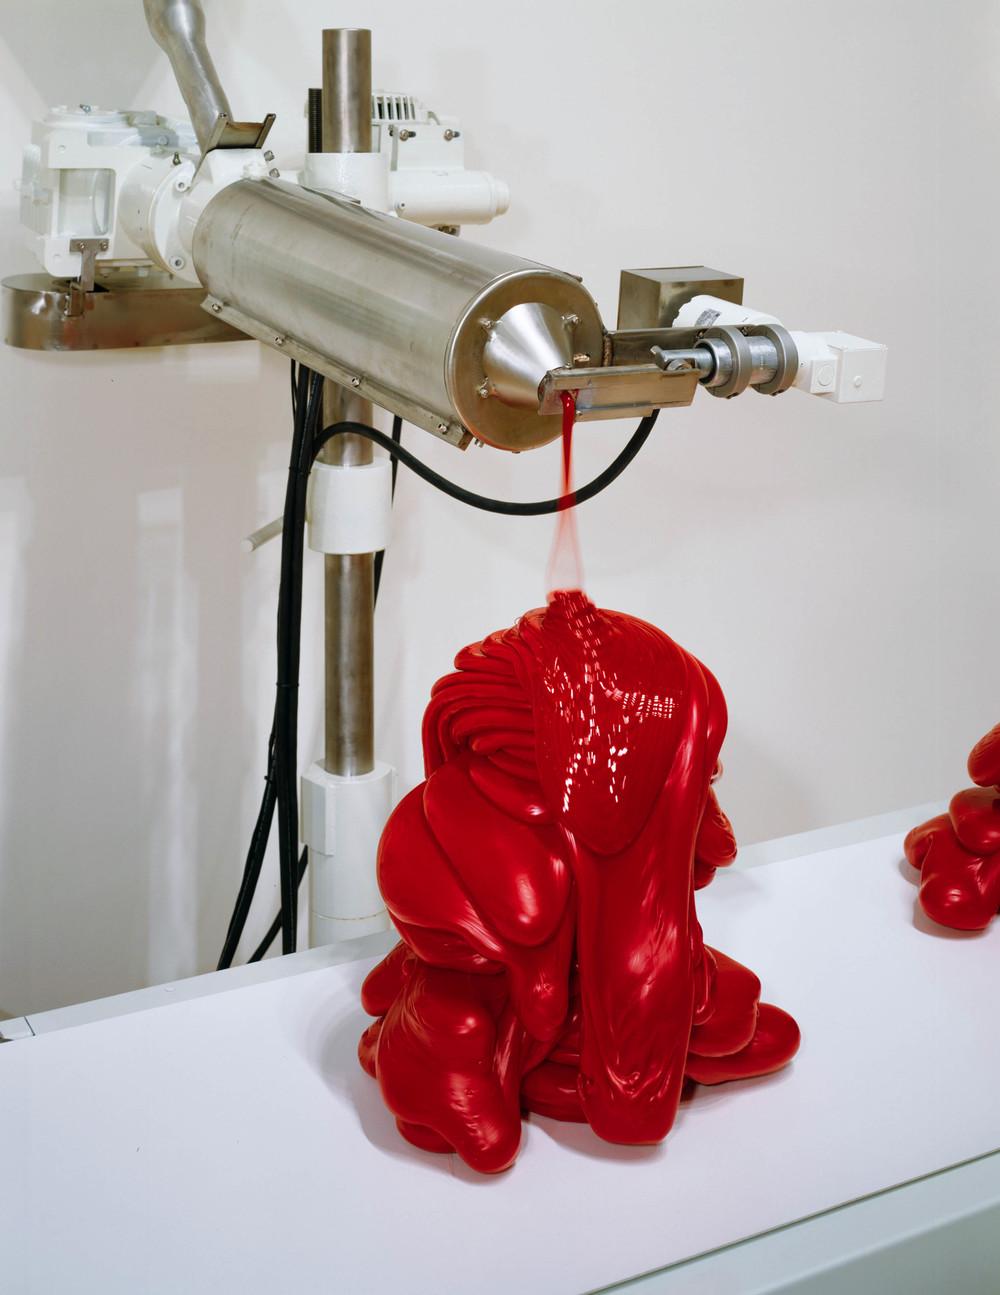 Scumak No. 2, 2000, aluminum, computer, conveyor, electronics, extruder, stainless steel, polyethylene, teflon, 890 x 73 x 276 inches